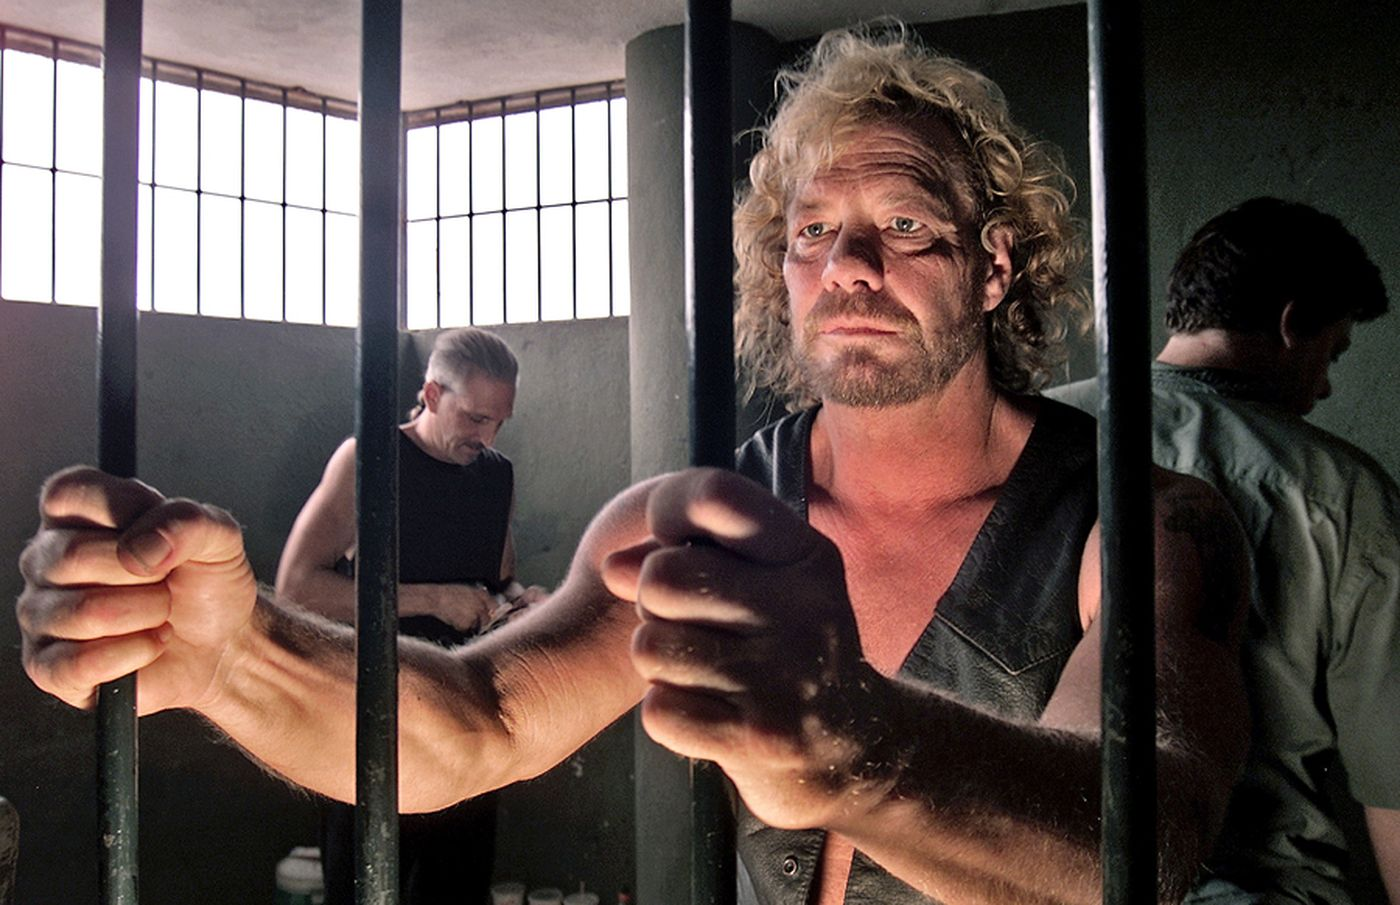 Duane Chapman behind the bars